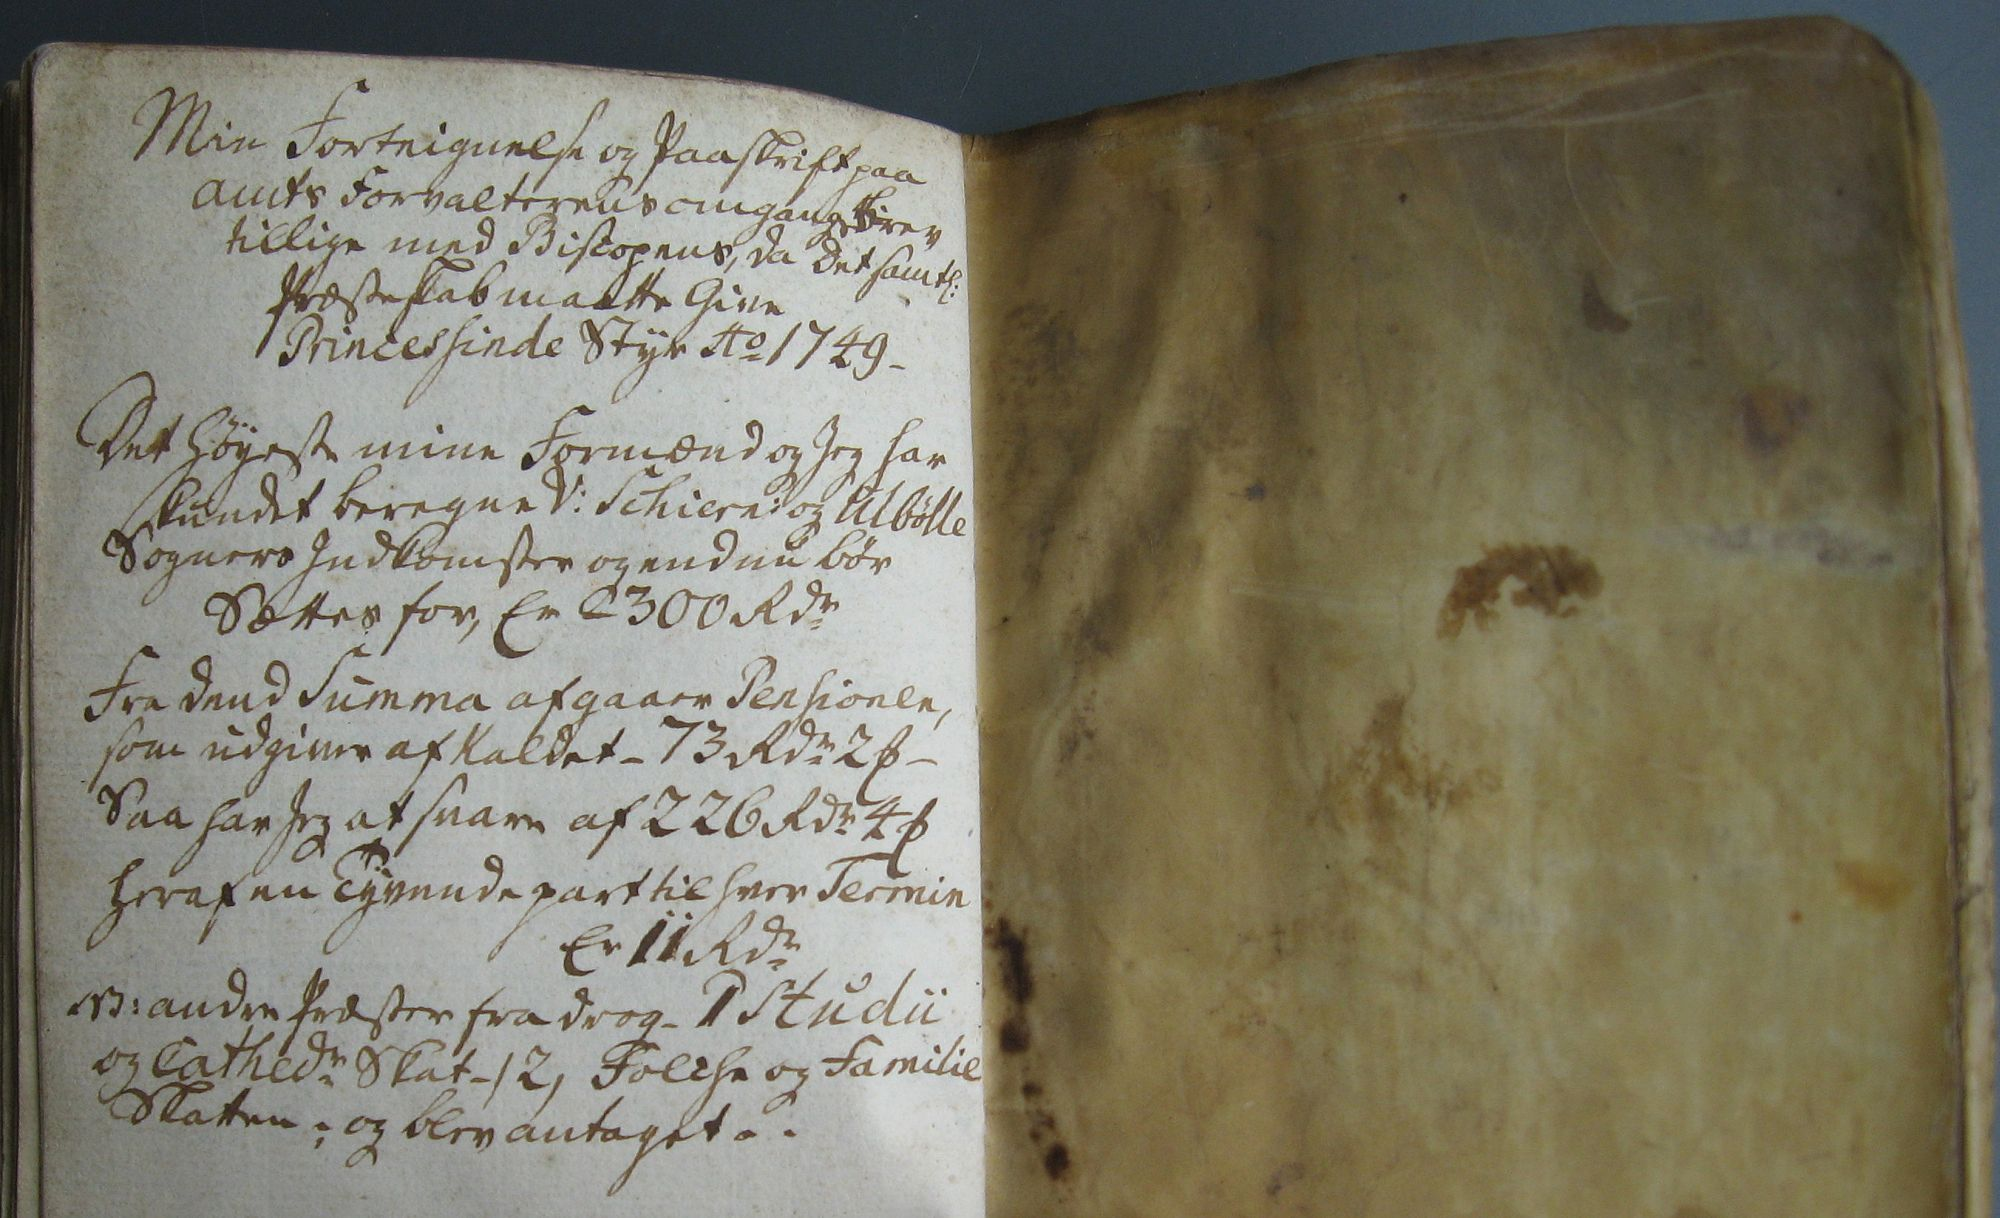 Lauritz Cruchow 1755 (22)